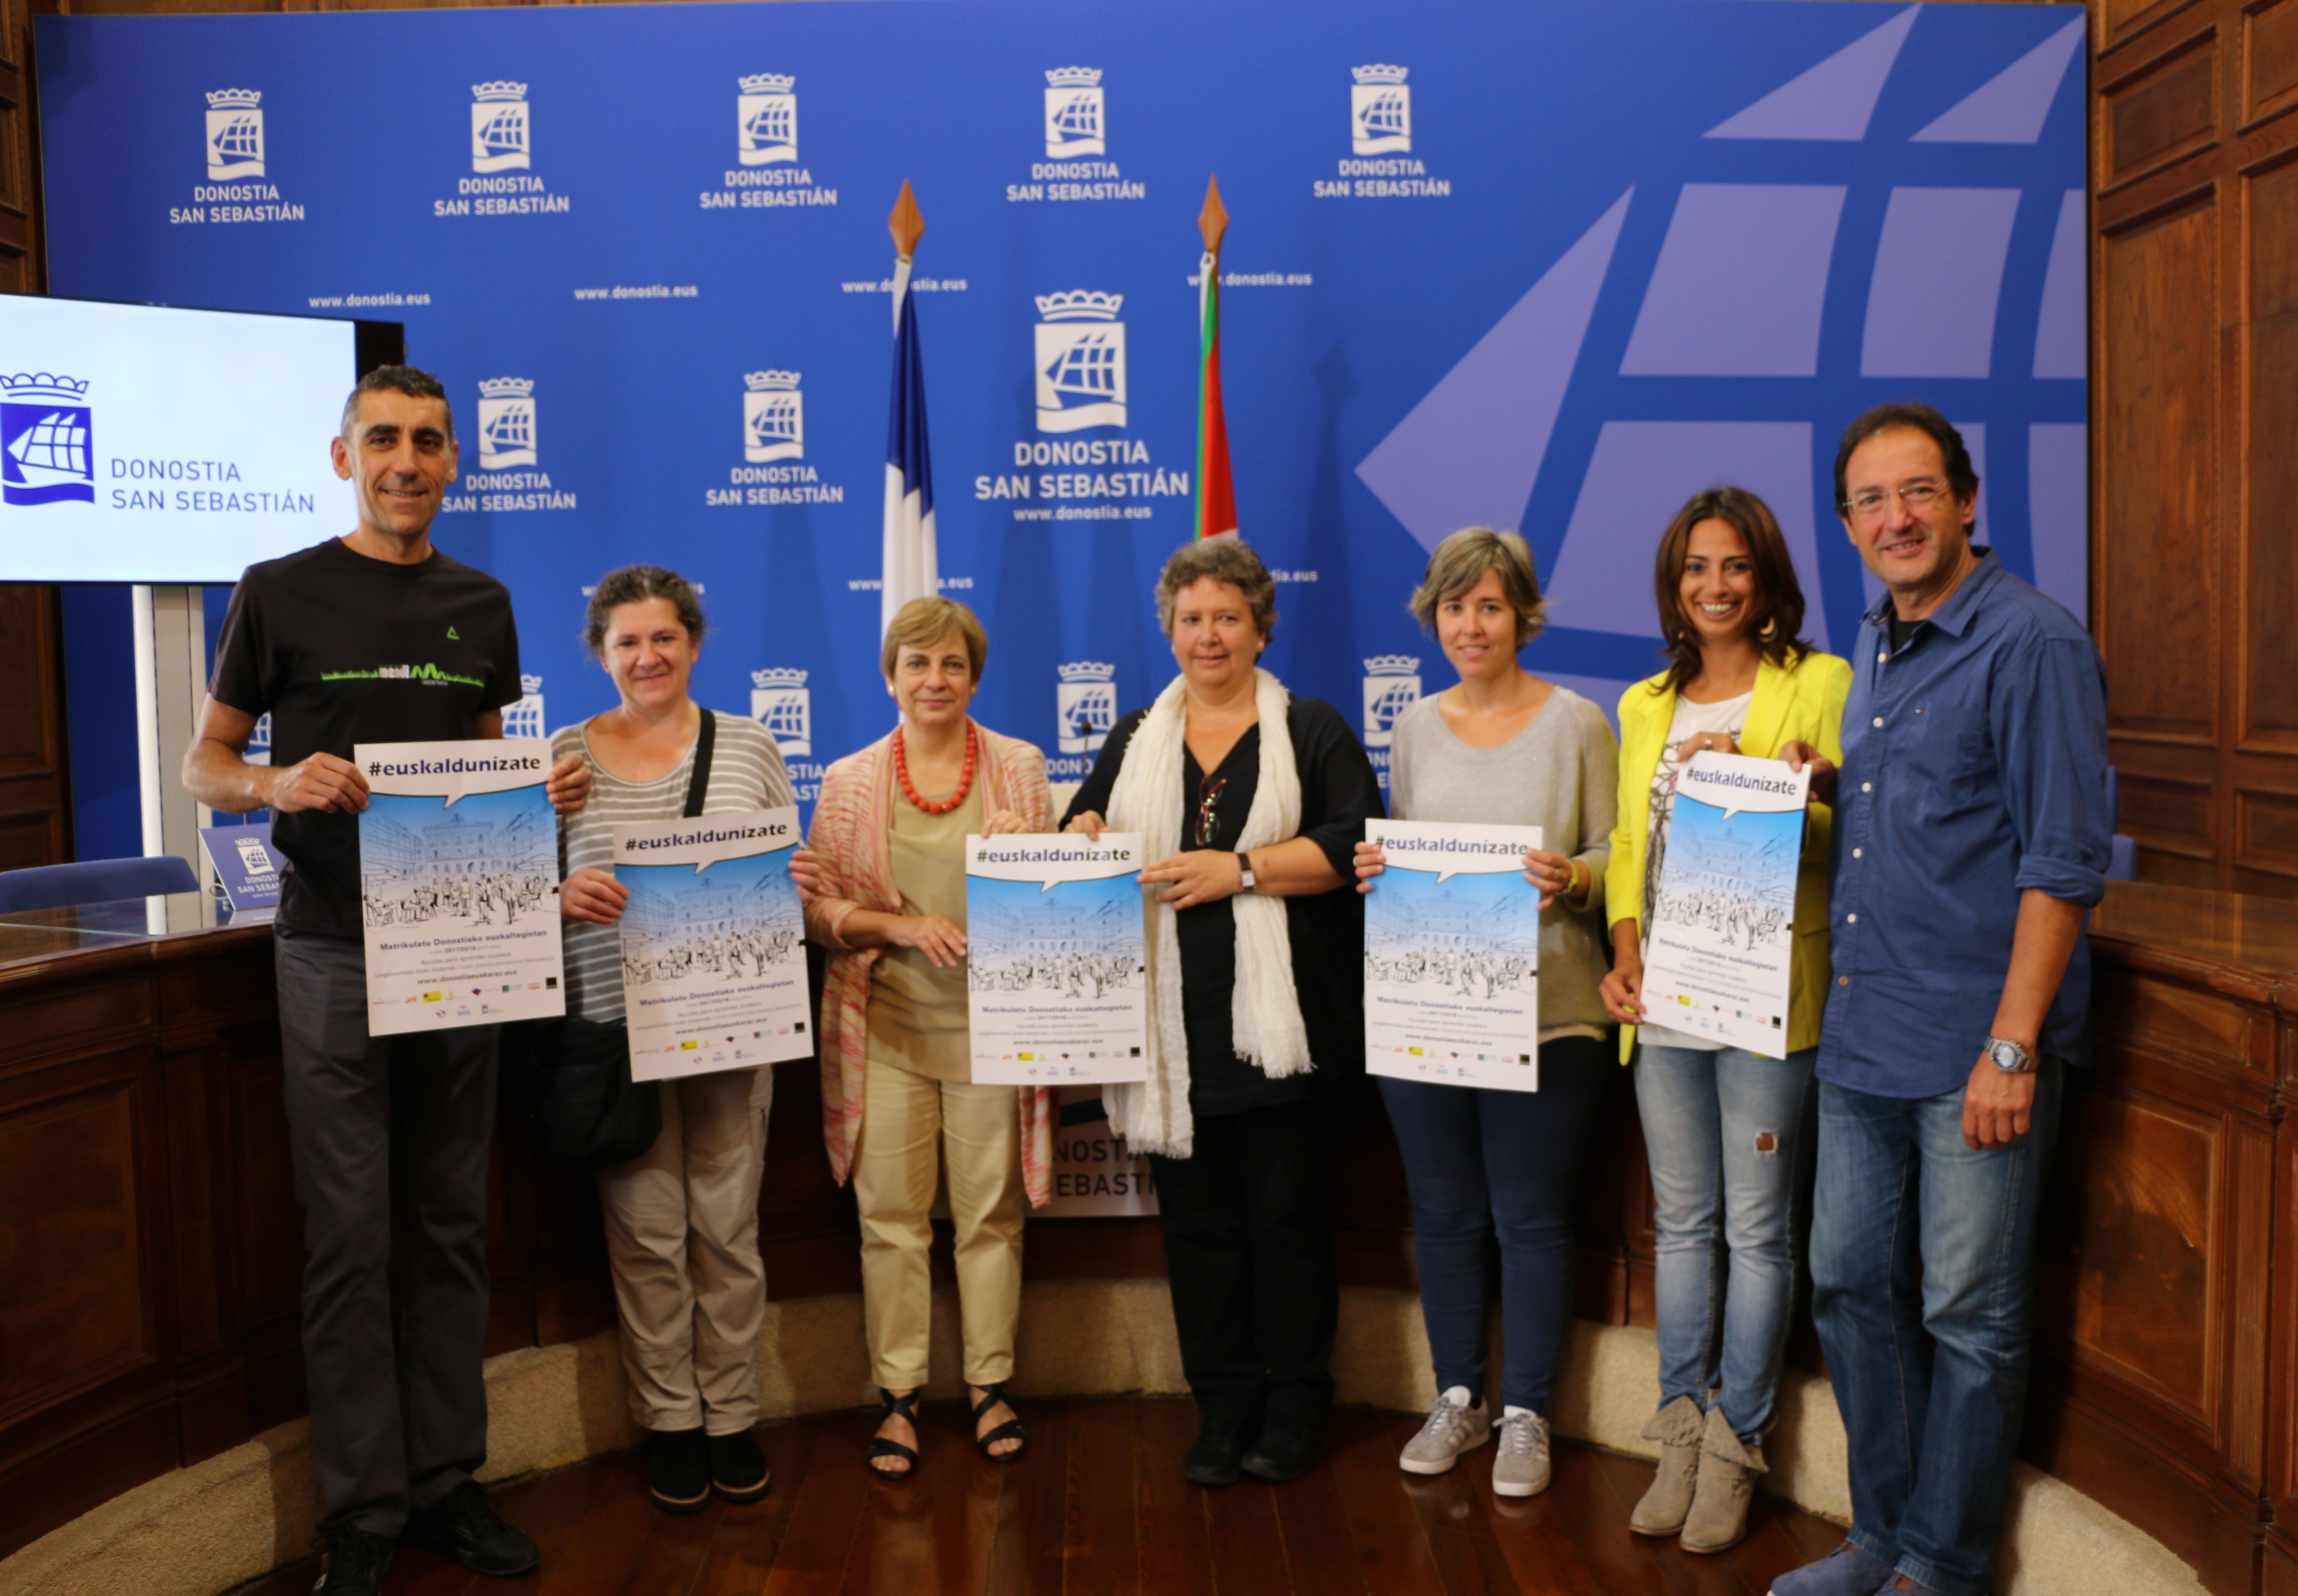 Rueda de prensa euskaldunizate